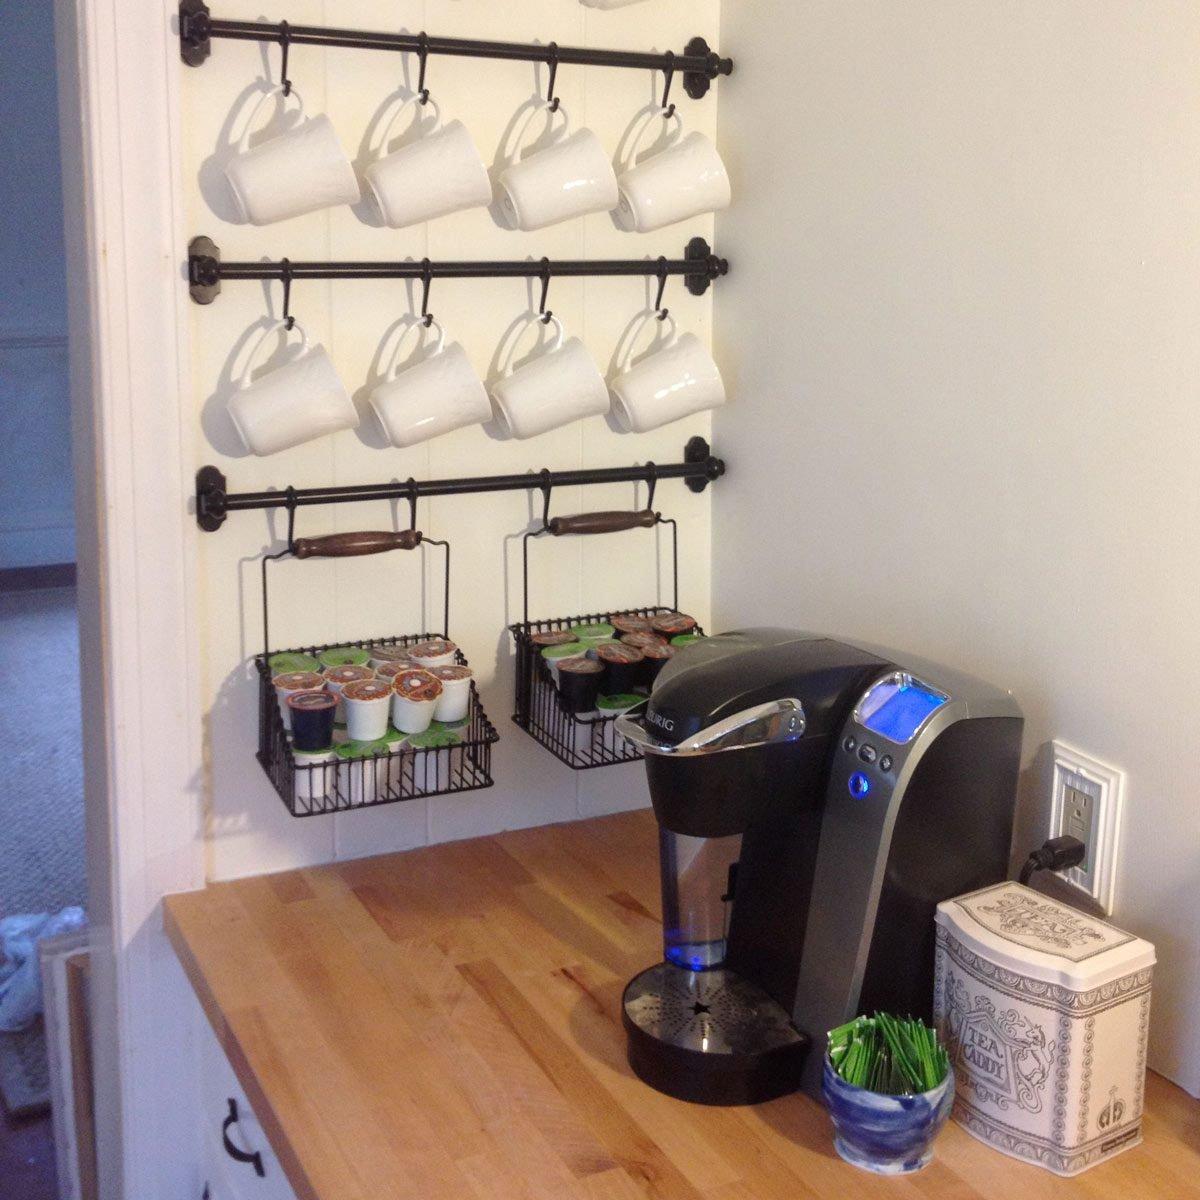 rail-tree-towel-bars-for-coffee-mugs